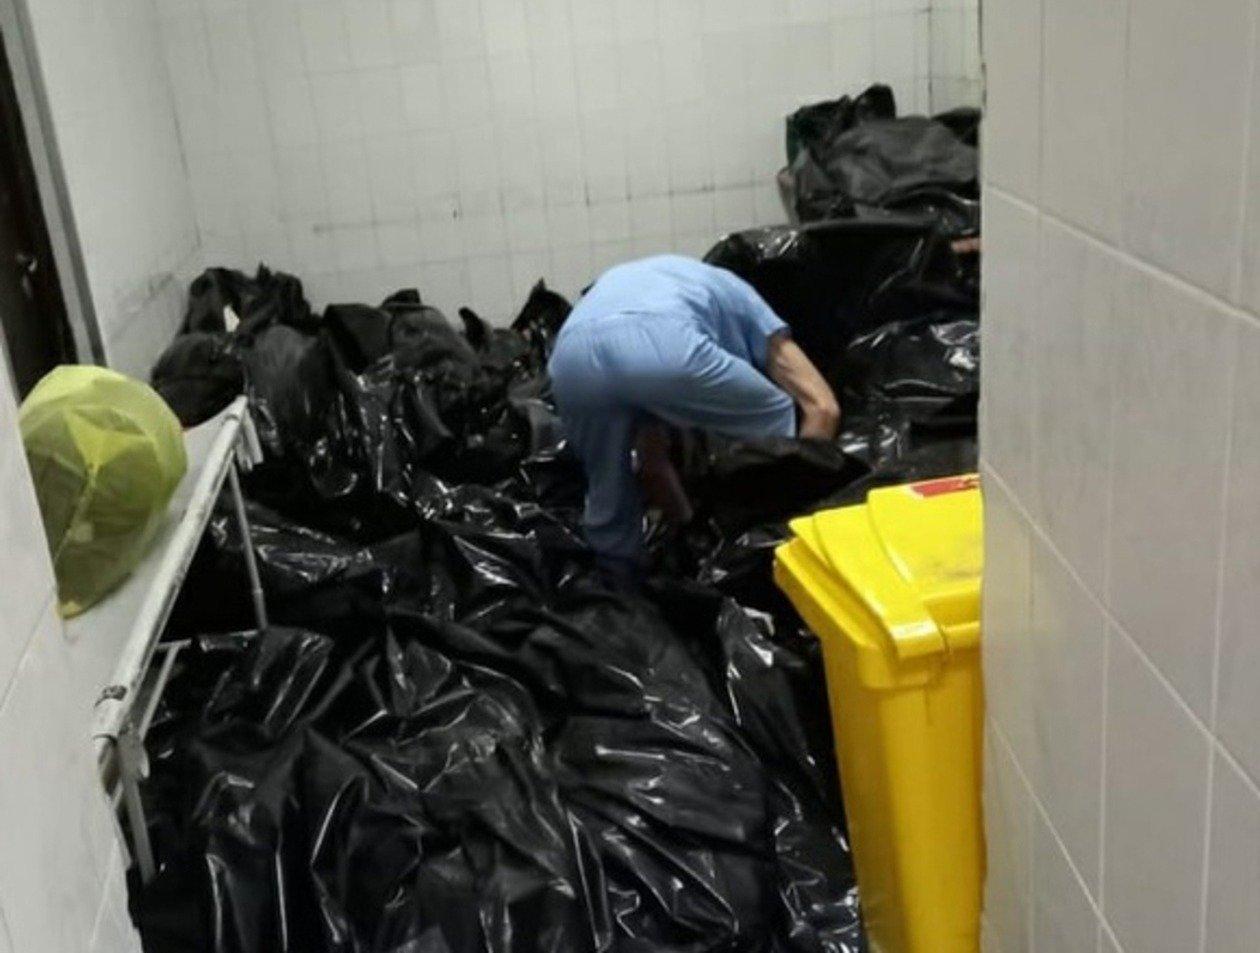 Томский губернатор нашел «крайних» в скандале с фото мешков из морга